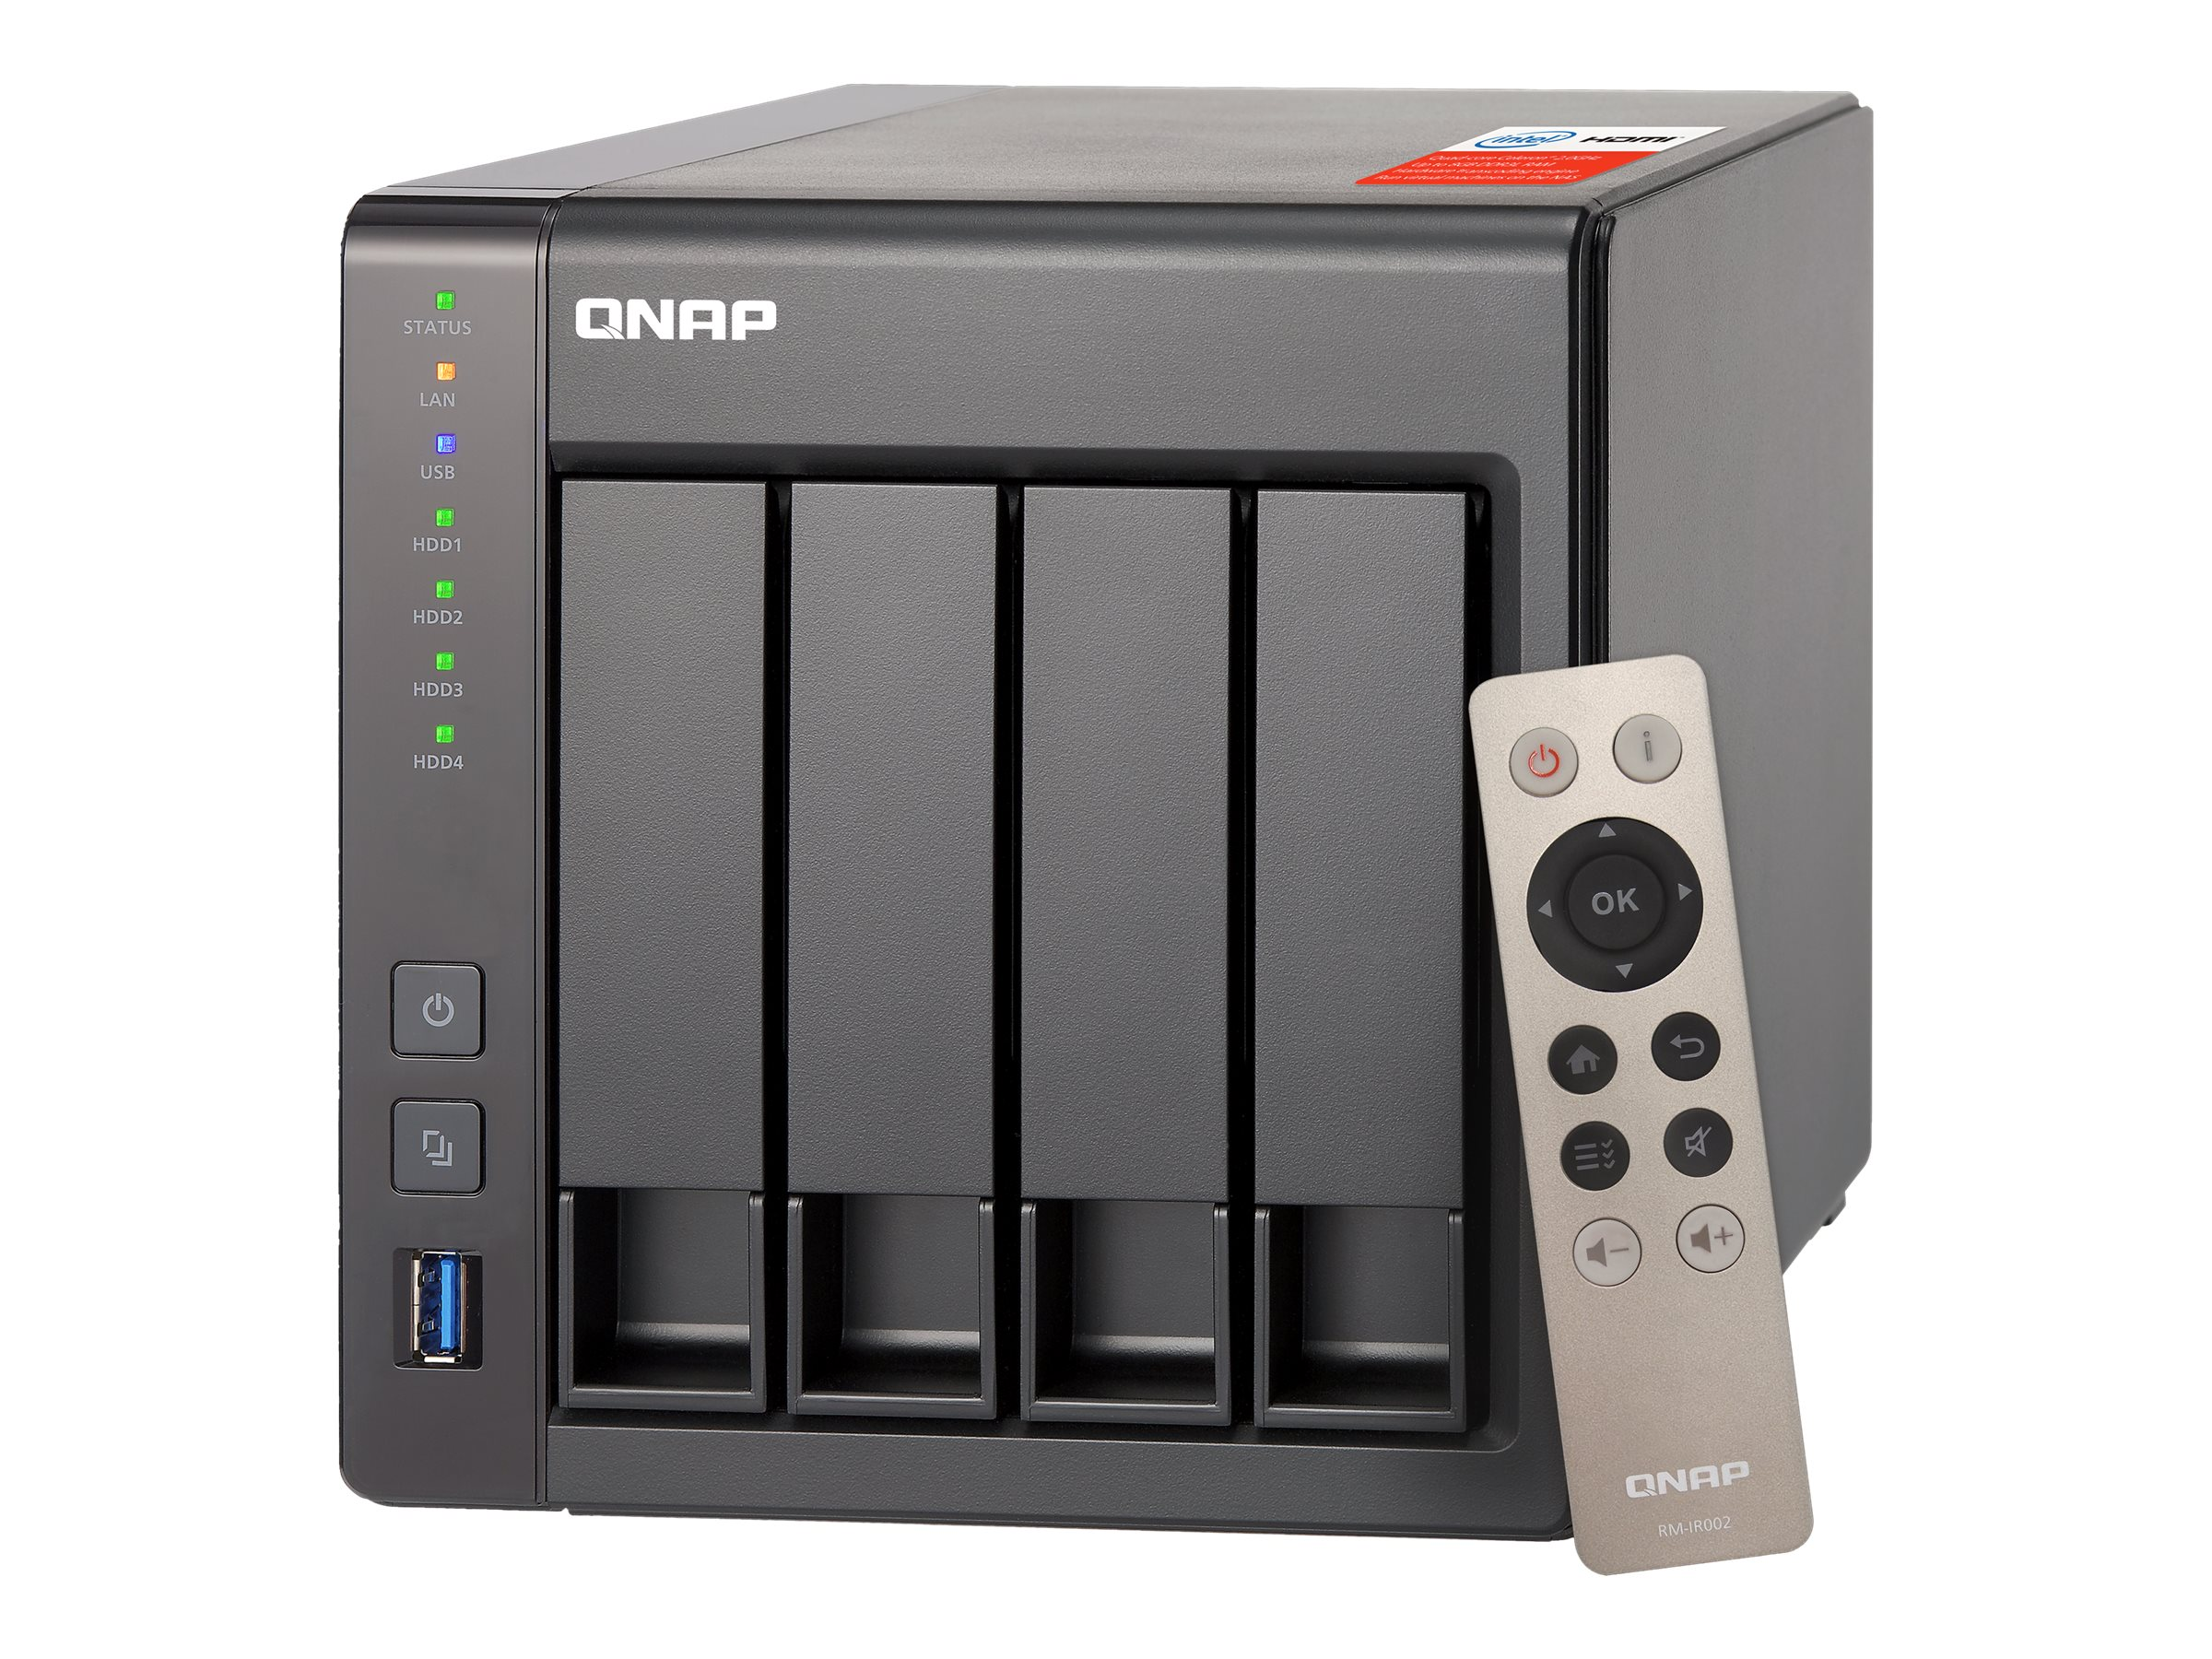 Vorschau: QNAP TS-451+ - NAS-Server - 4 Schächte - 16 TB